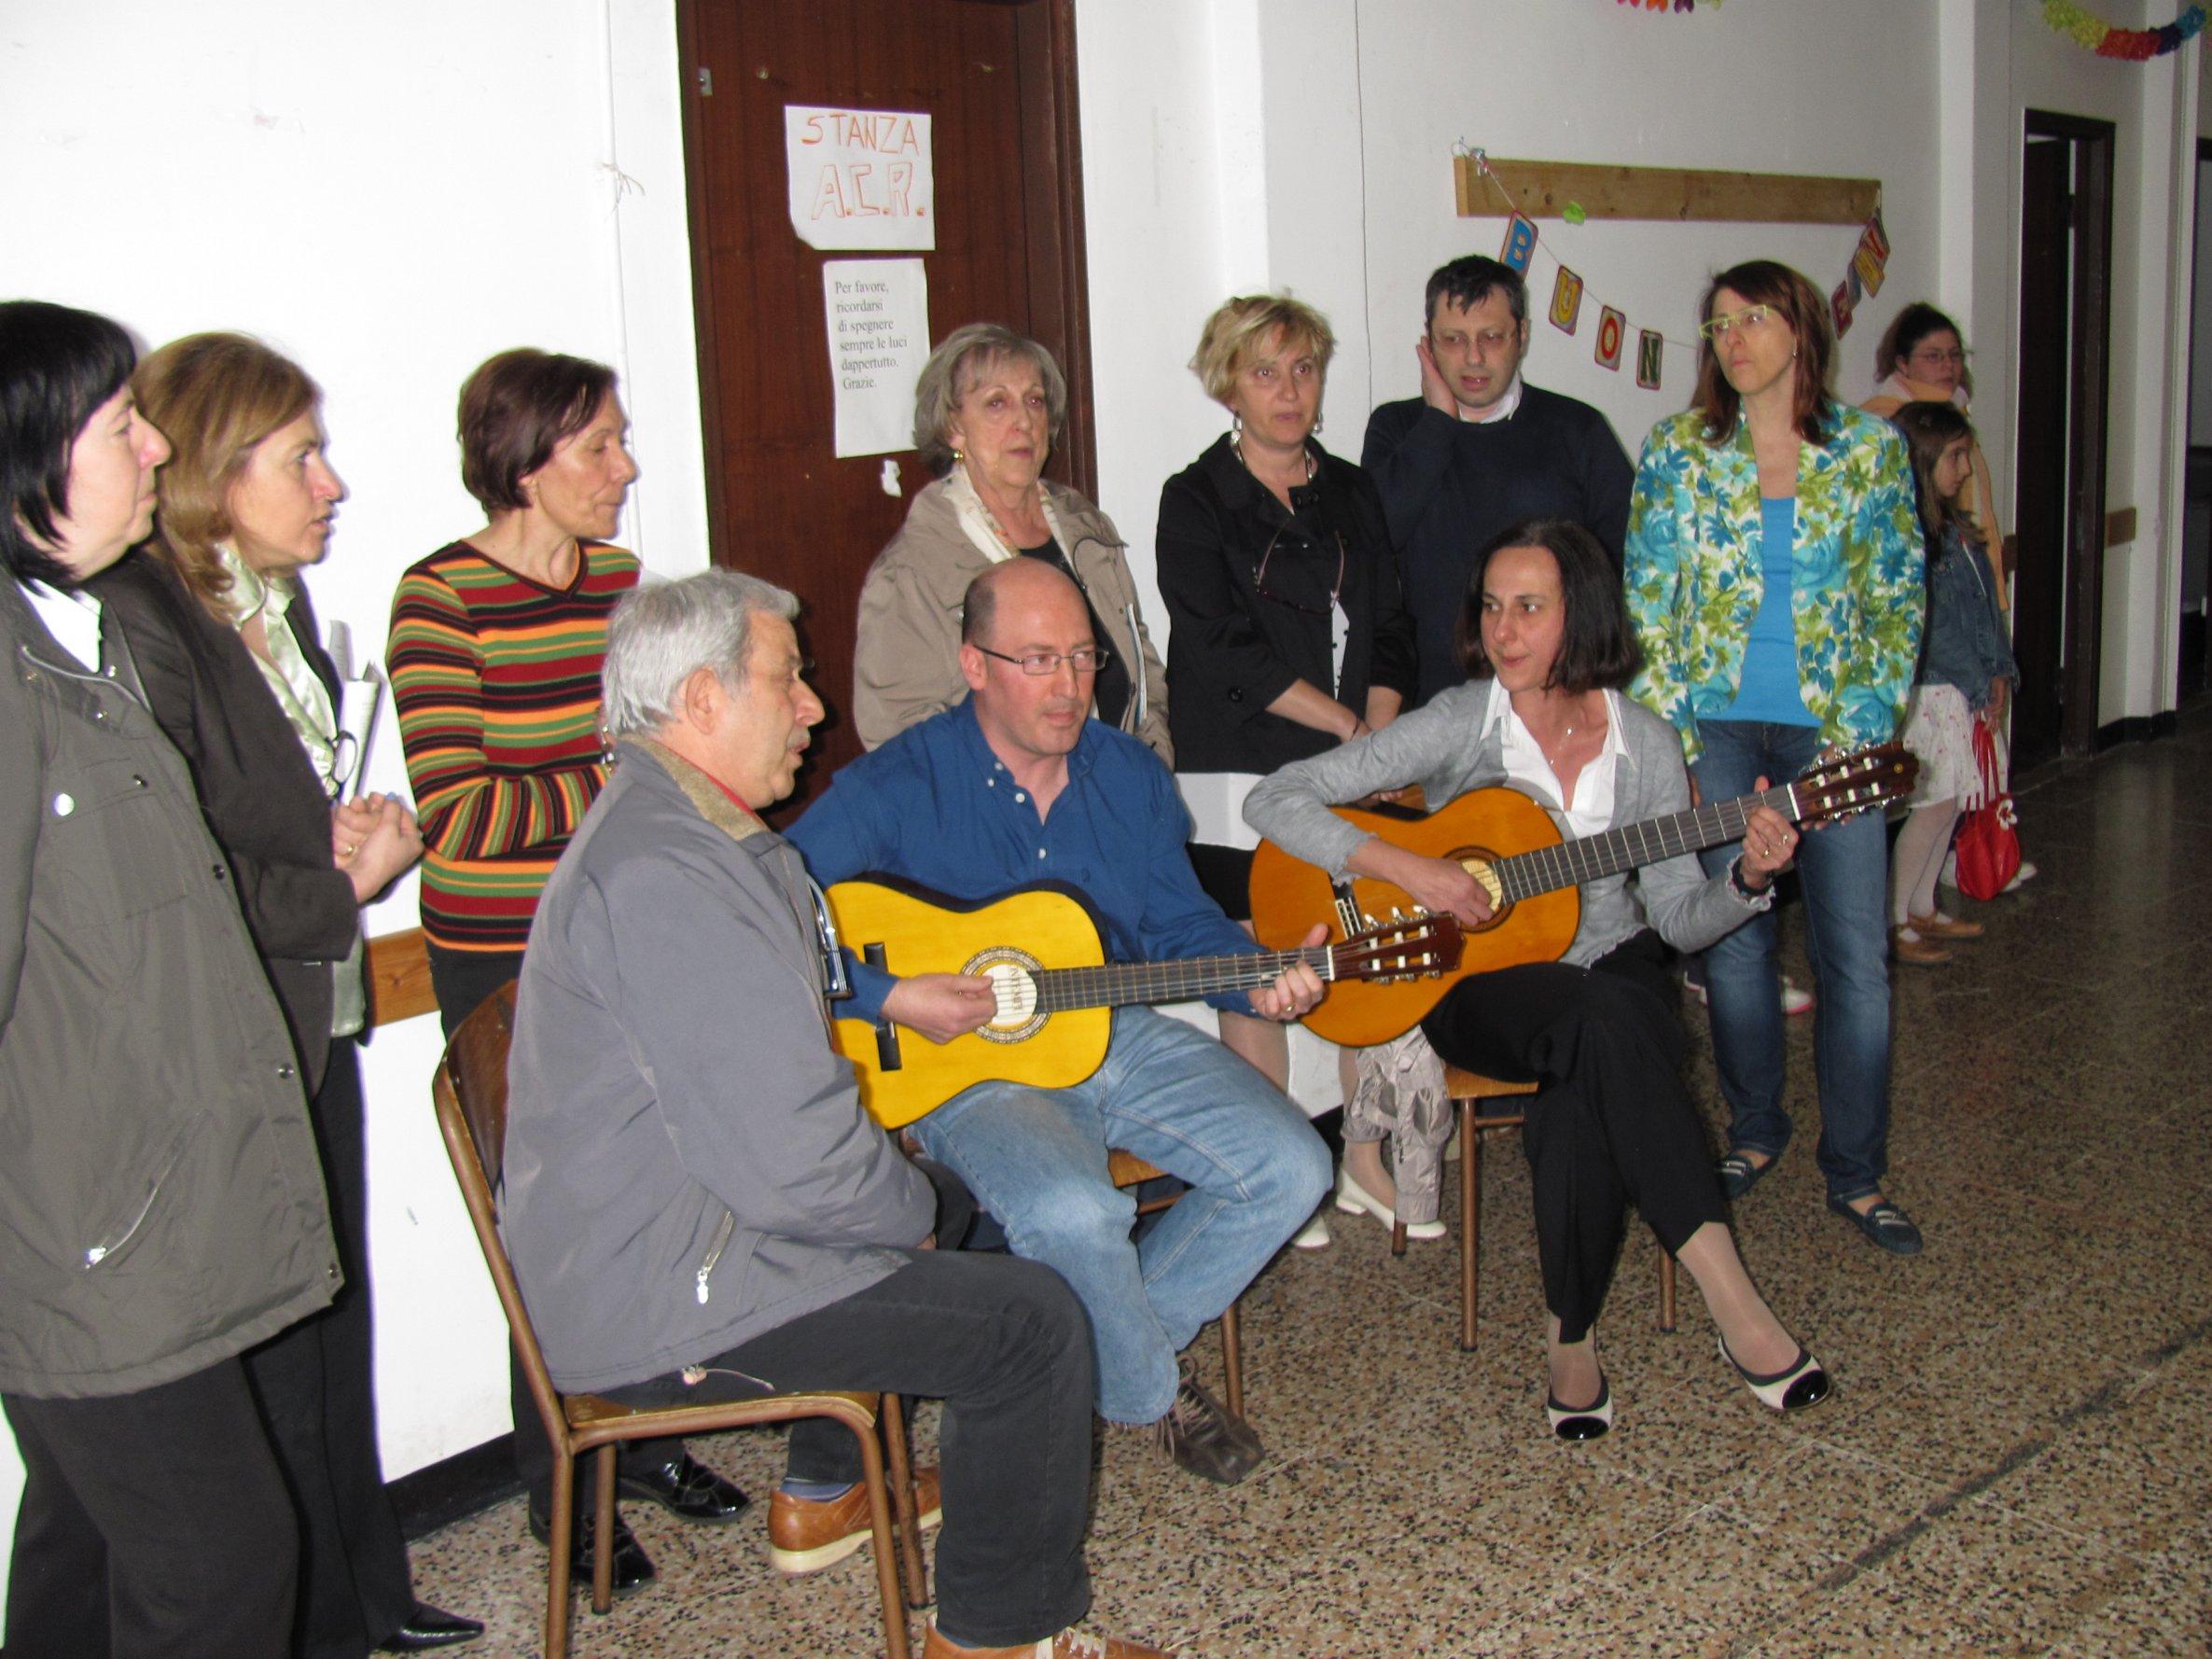 bagnasco_e_famiglie_vicariato_2013-05-26-14-37-46